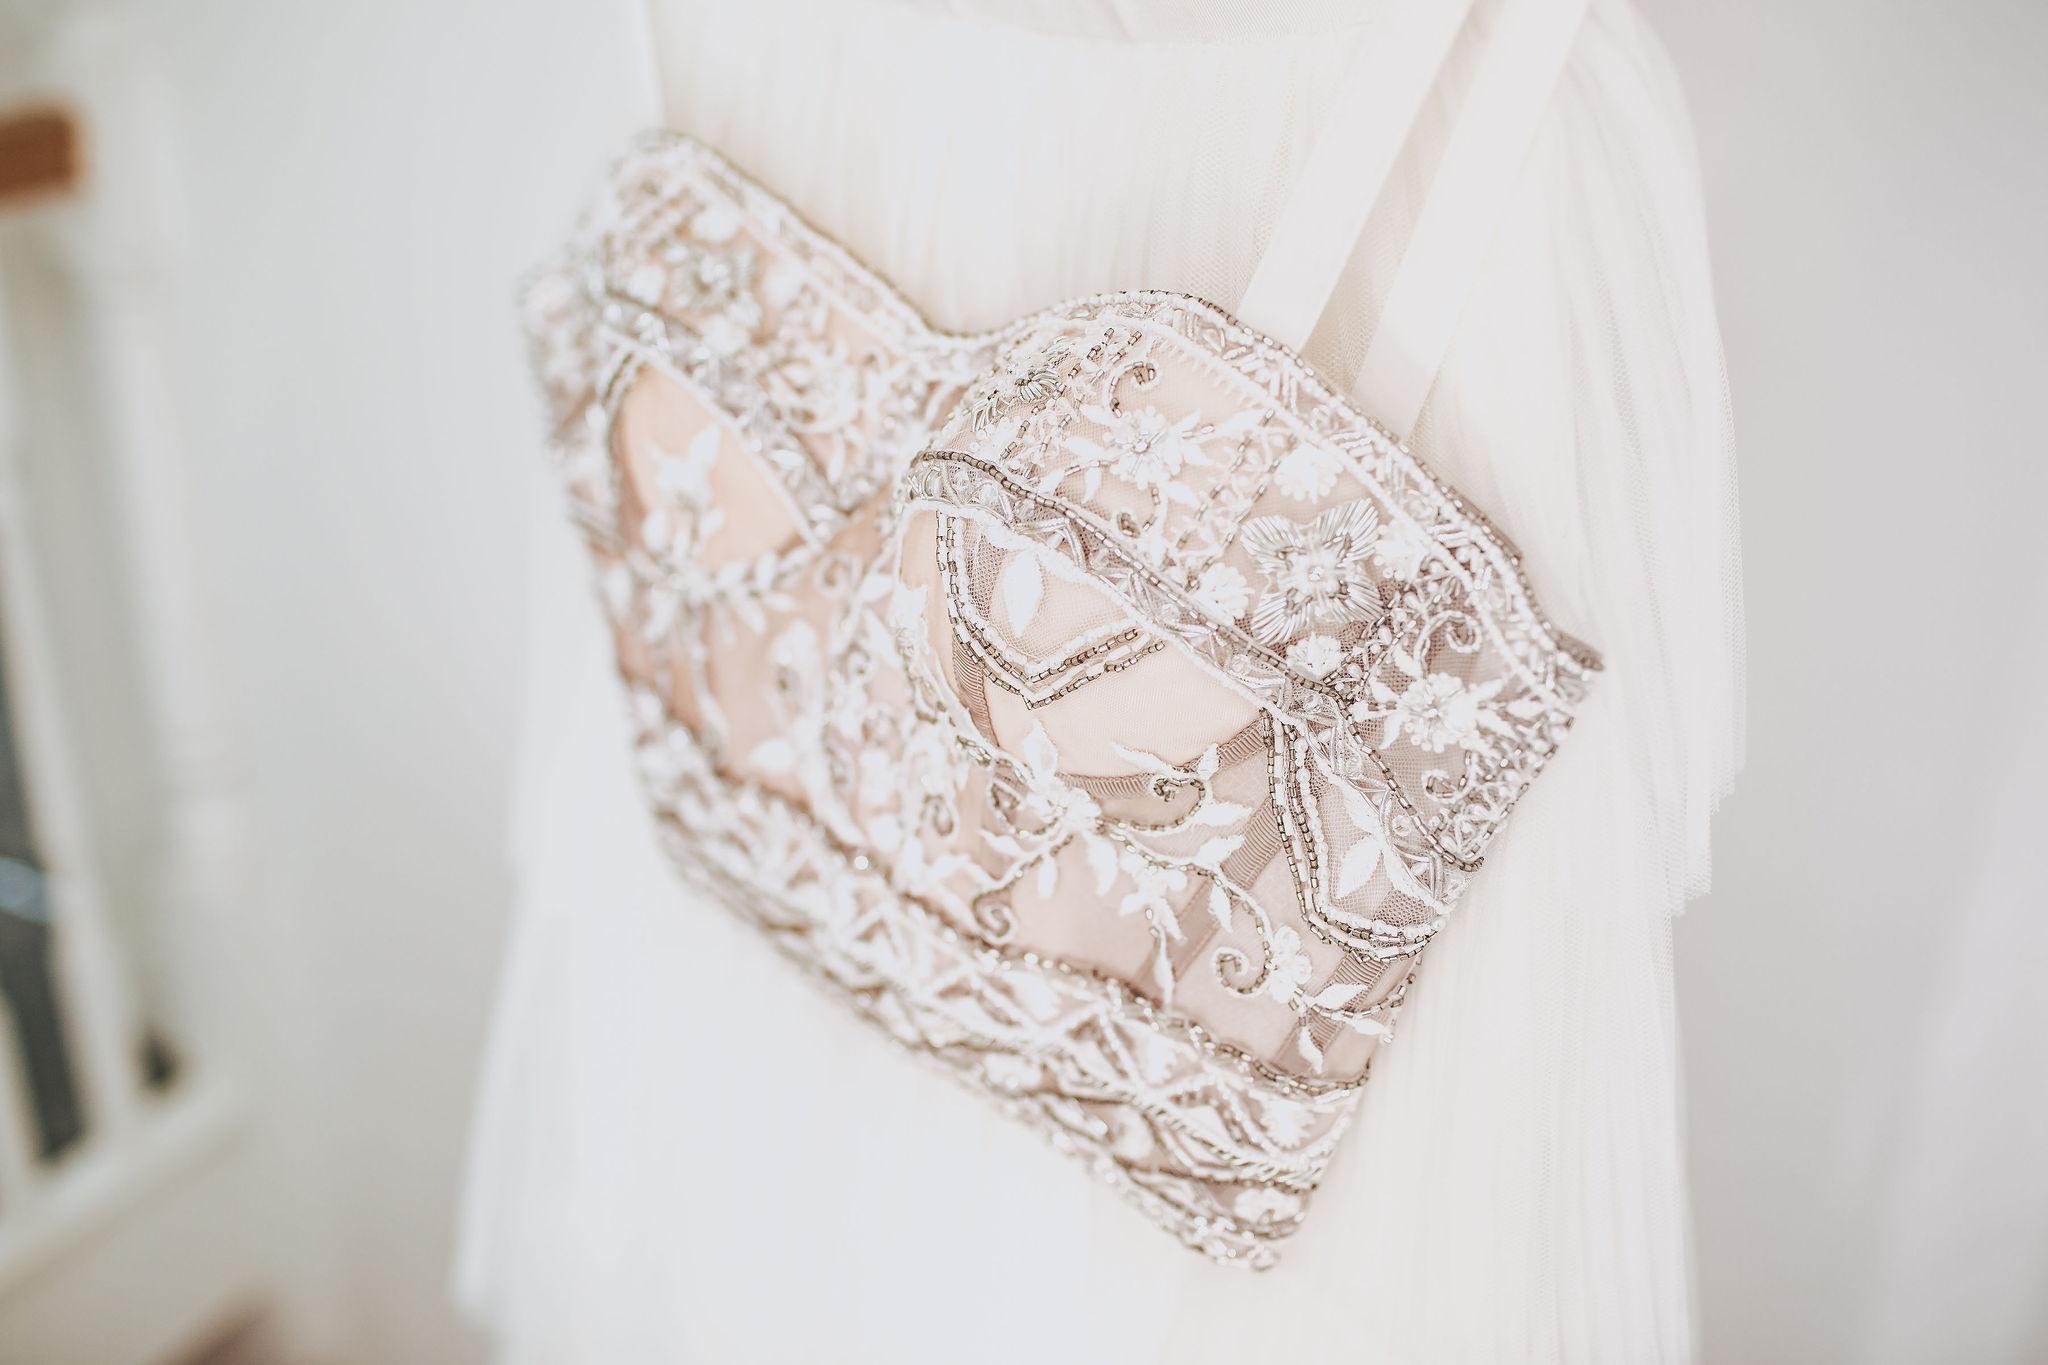 canvas-and-light-white-tipis-bridal-indulgence-2.jpg